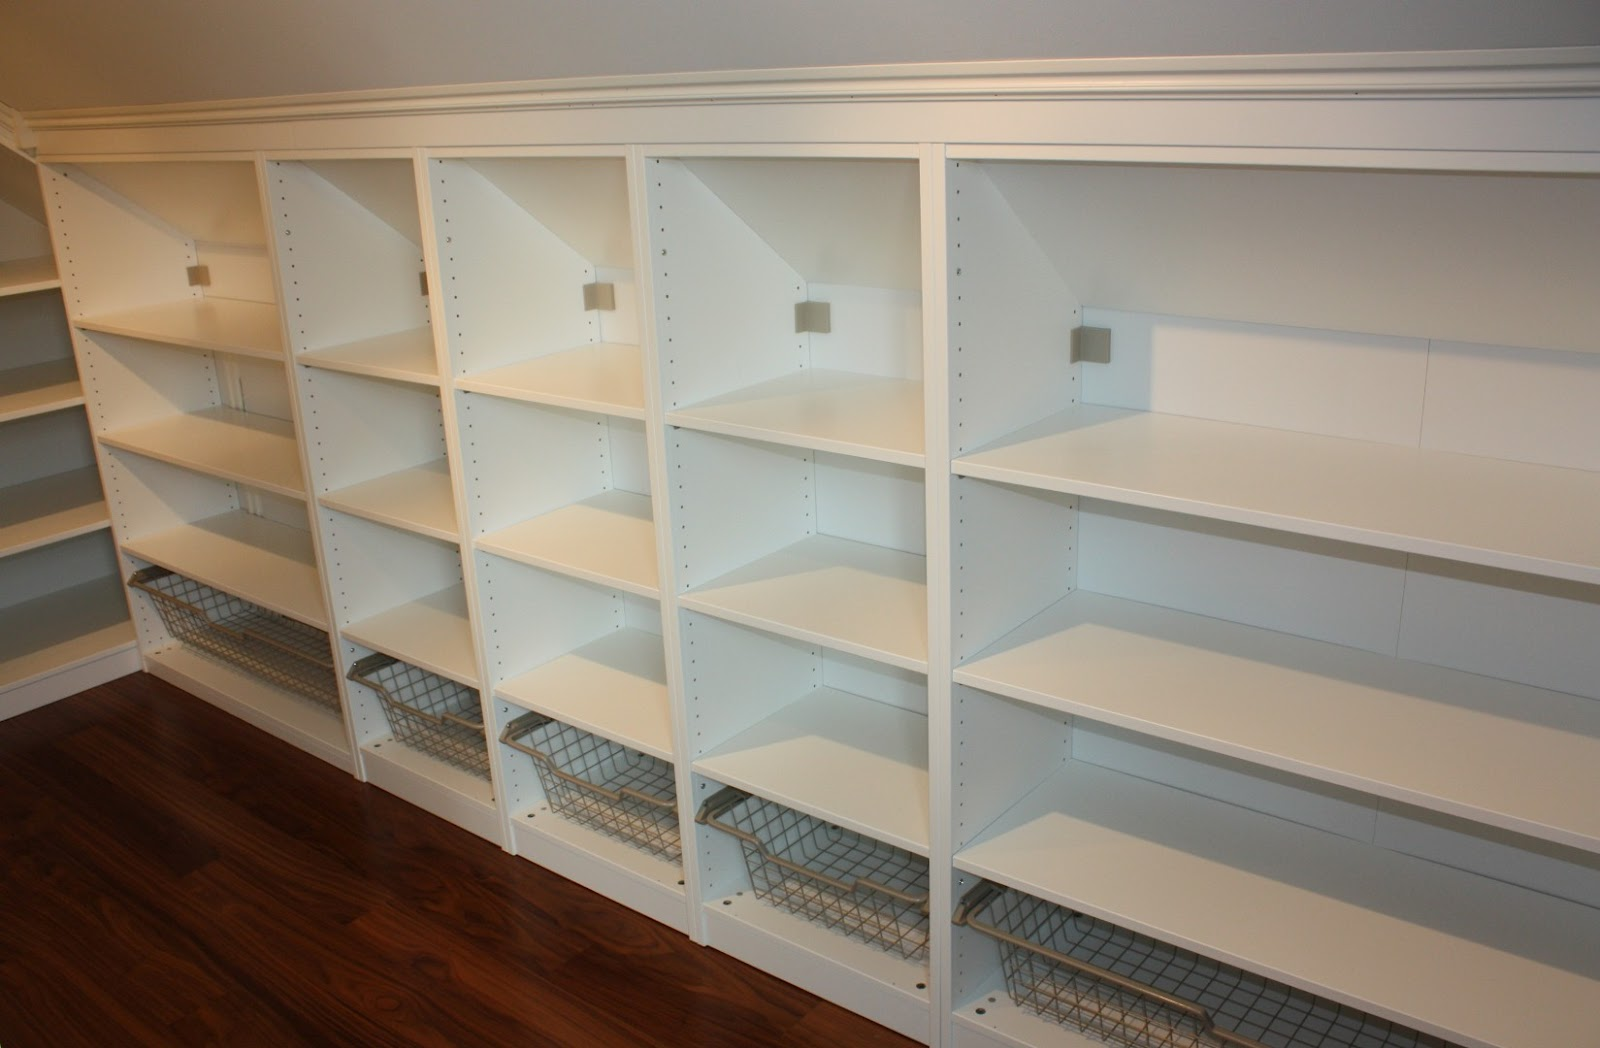 ikea klesskap affordable garderobe p with ikea klesskap. Black Bedroom Furniture Sets. Home Design Ideas